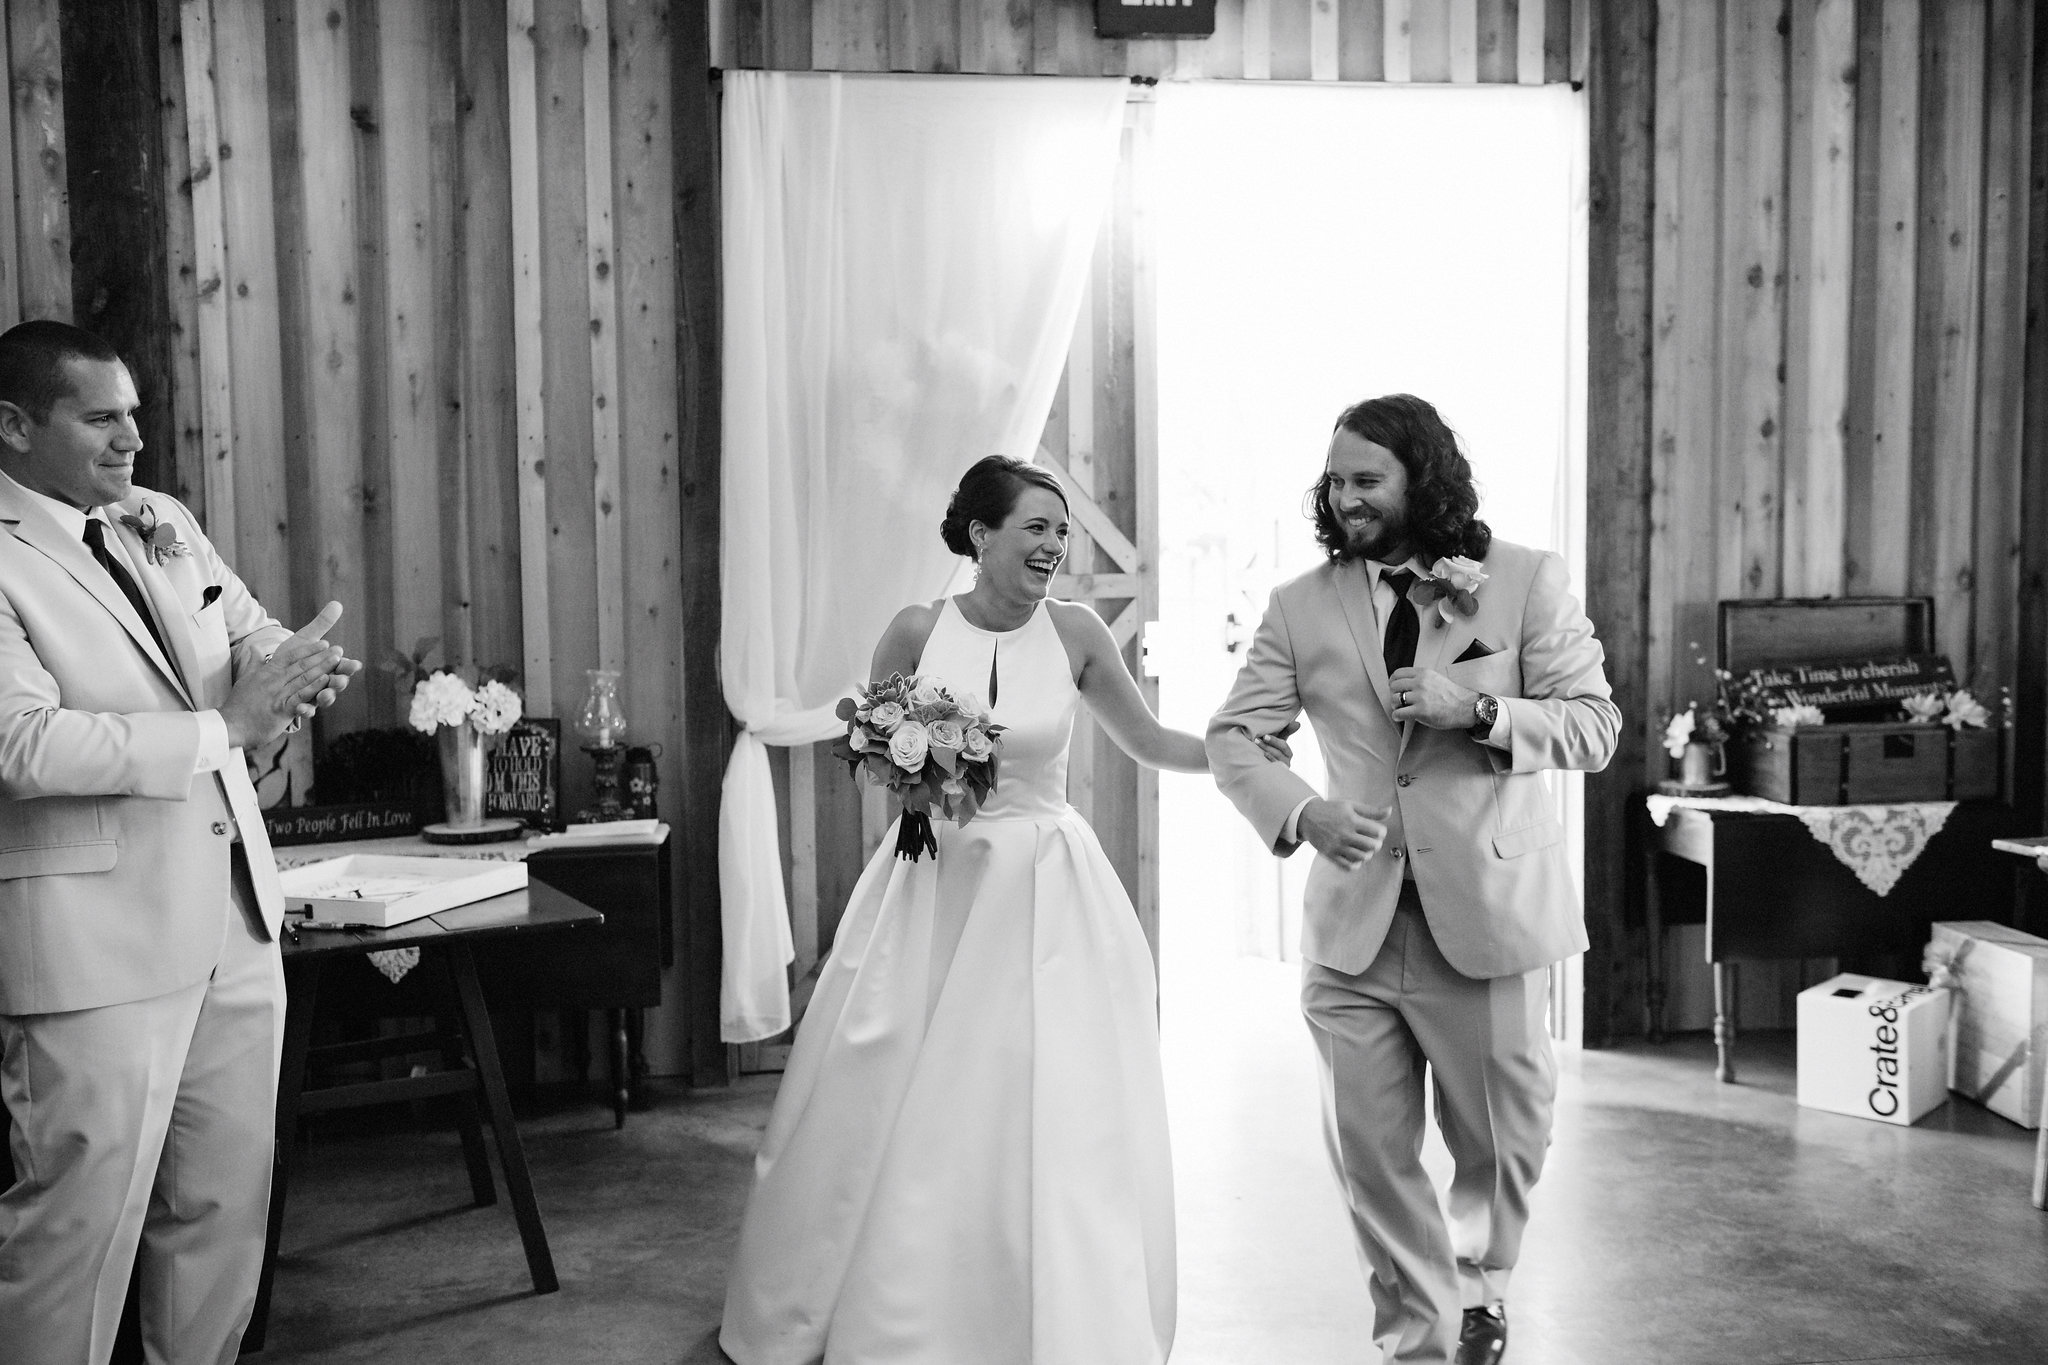 Lindsay&JoshMarried2017-08-31at19.08.11PM38.jpg